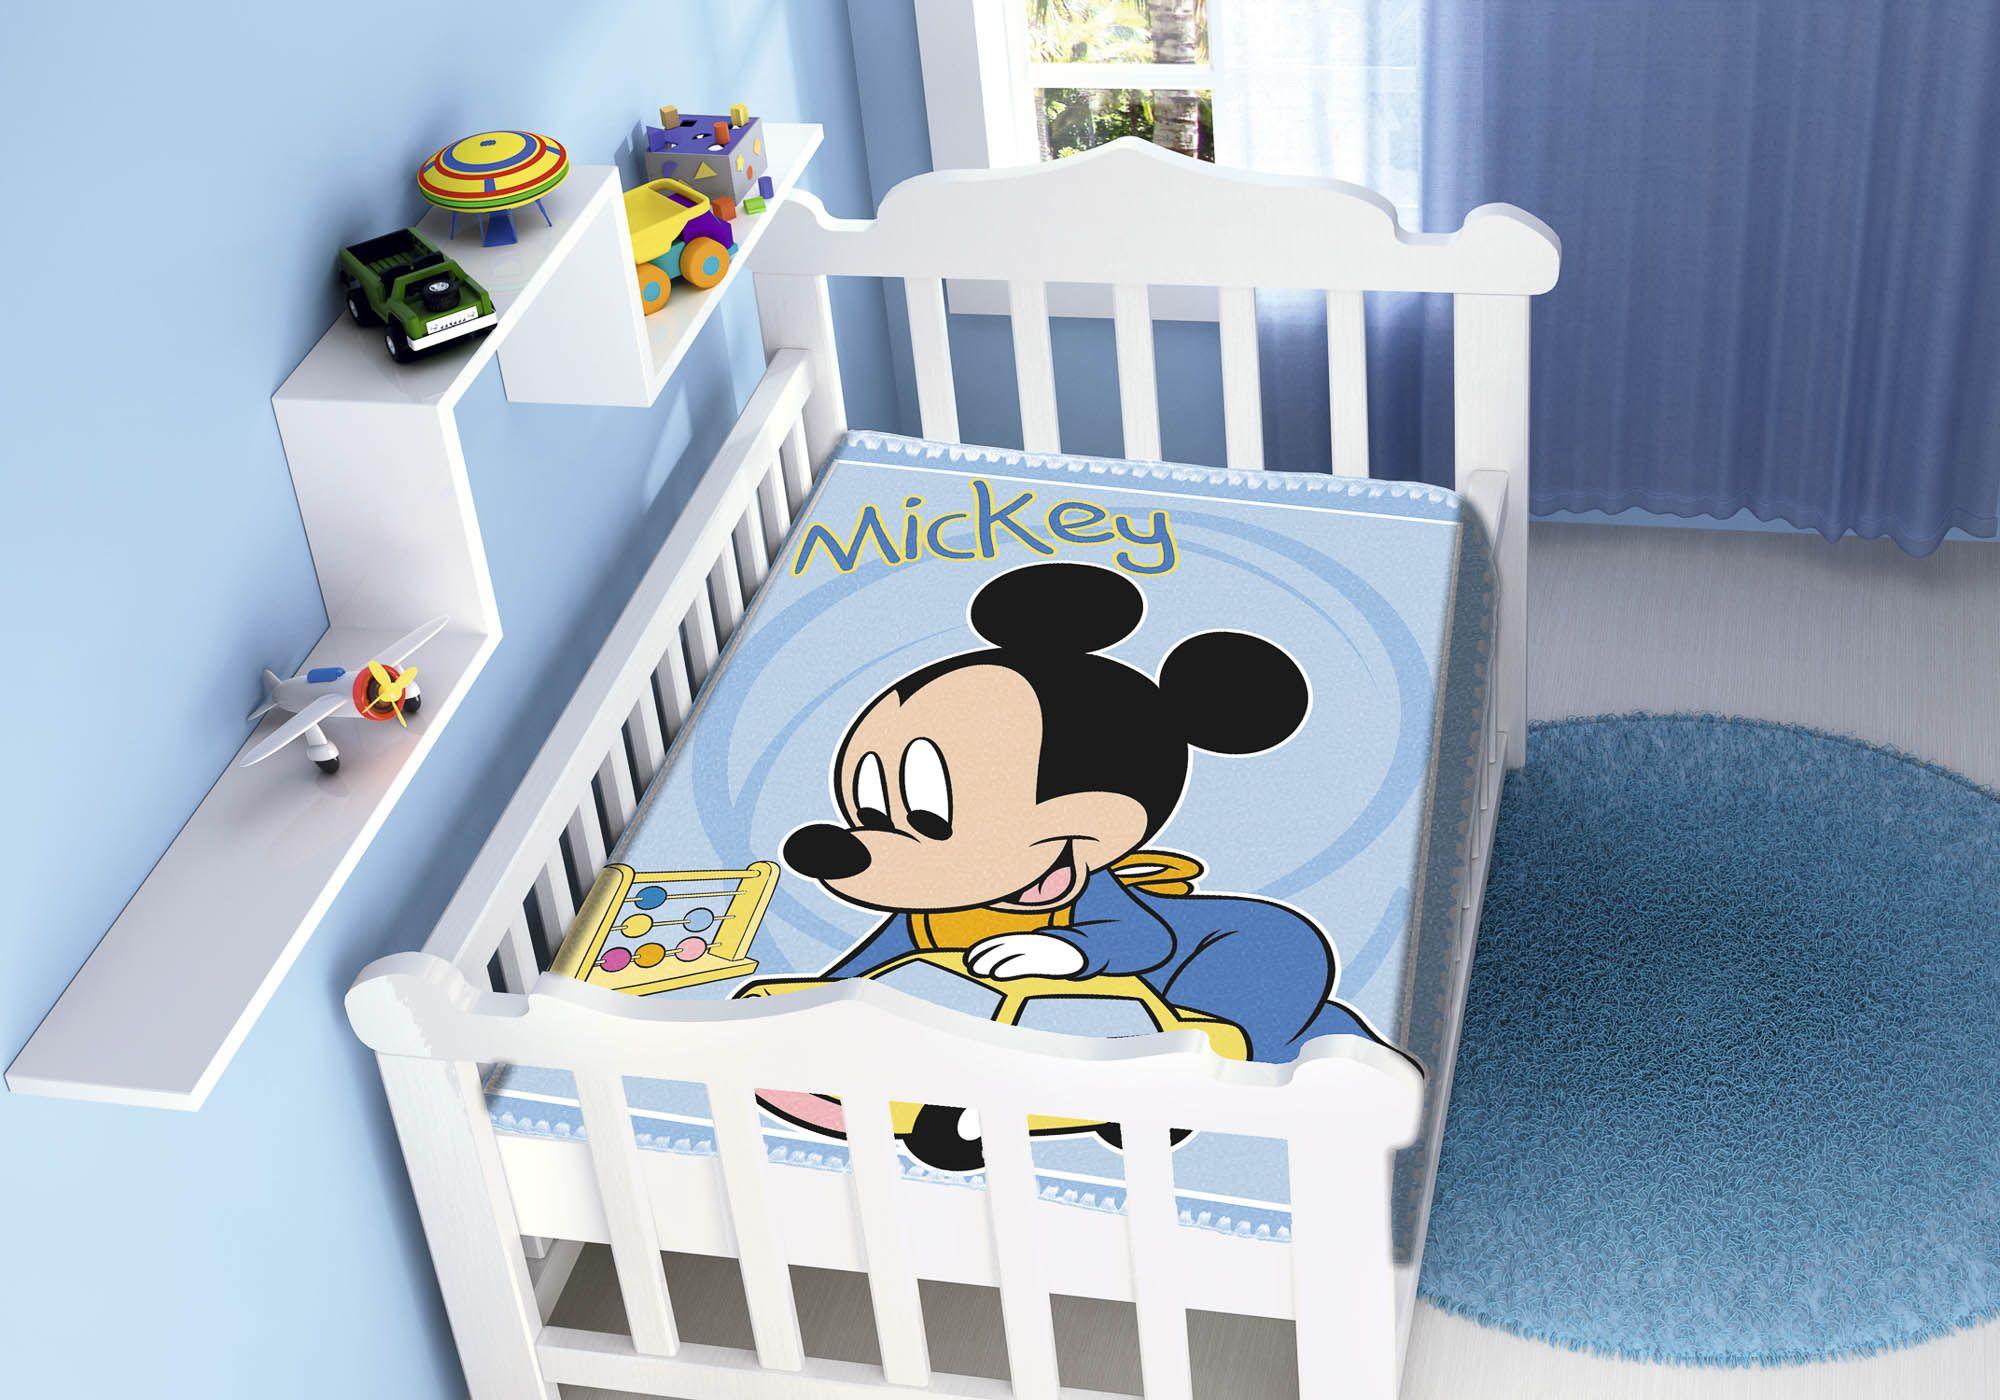 Cobertor Jolitex Raschel Infantil 0,90x1,10m Disney Mickey Diversão Carro